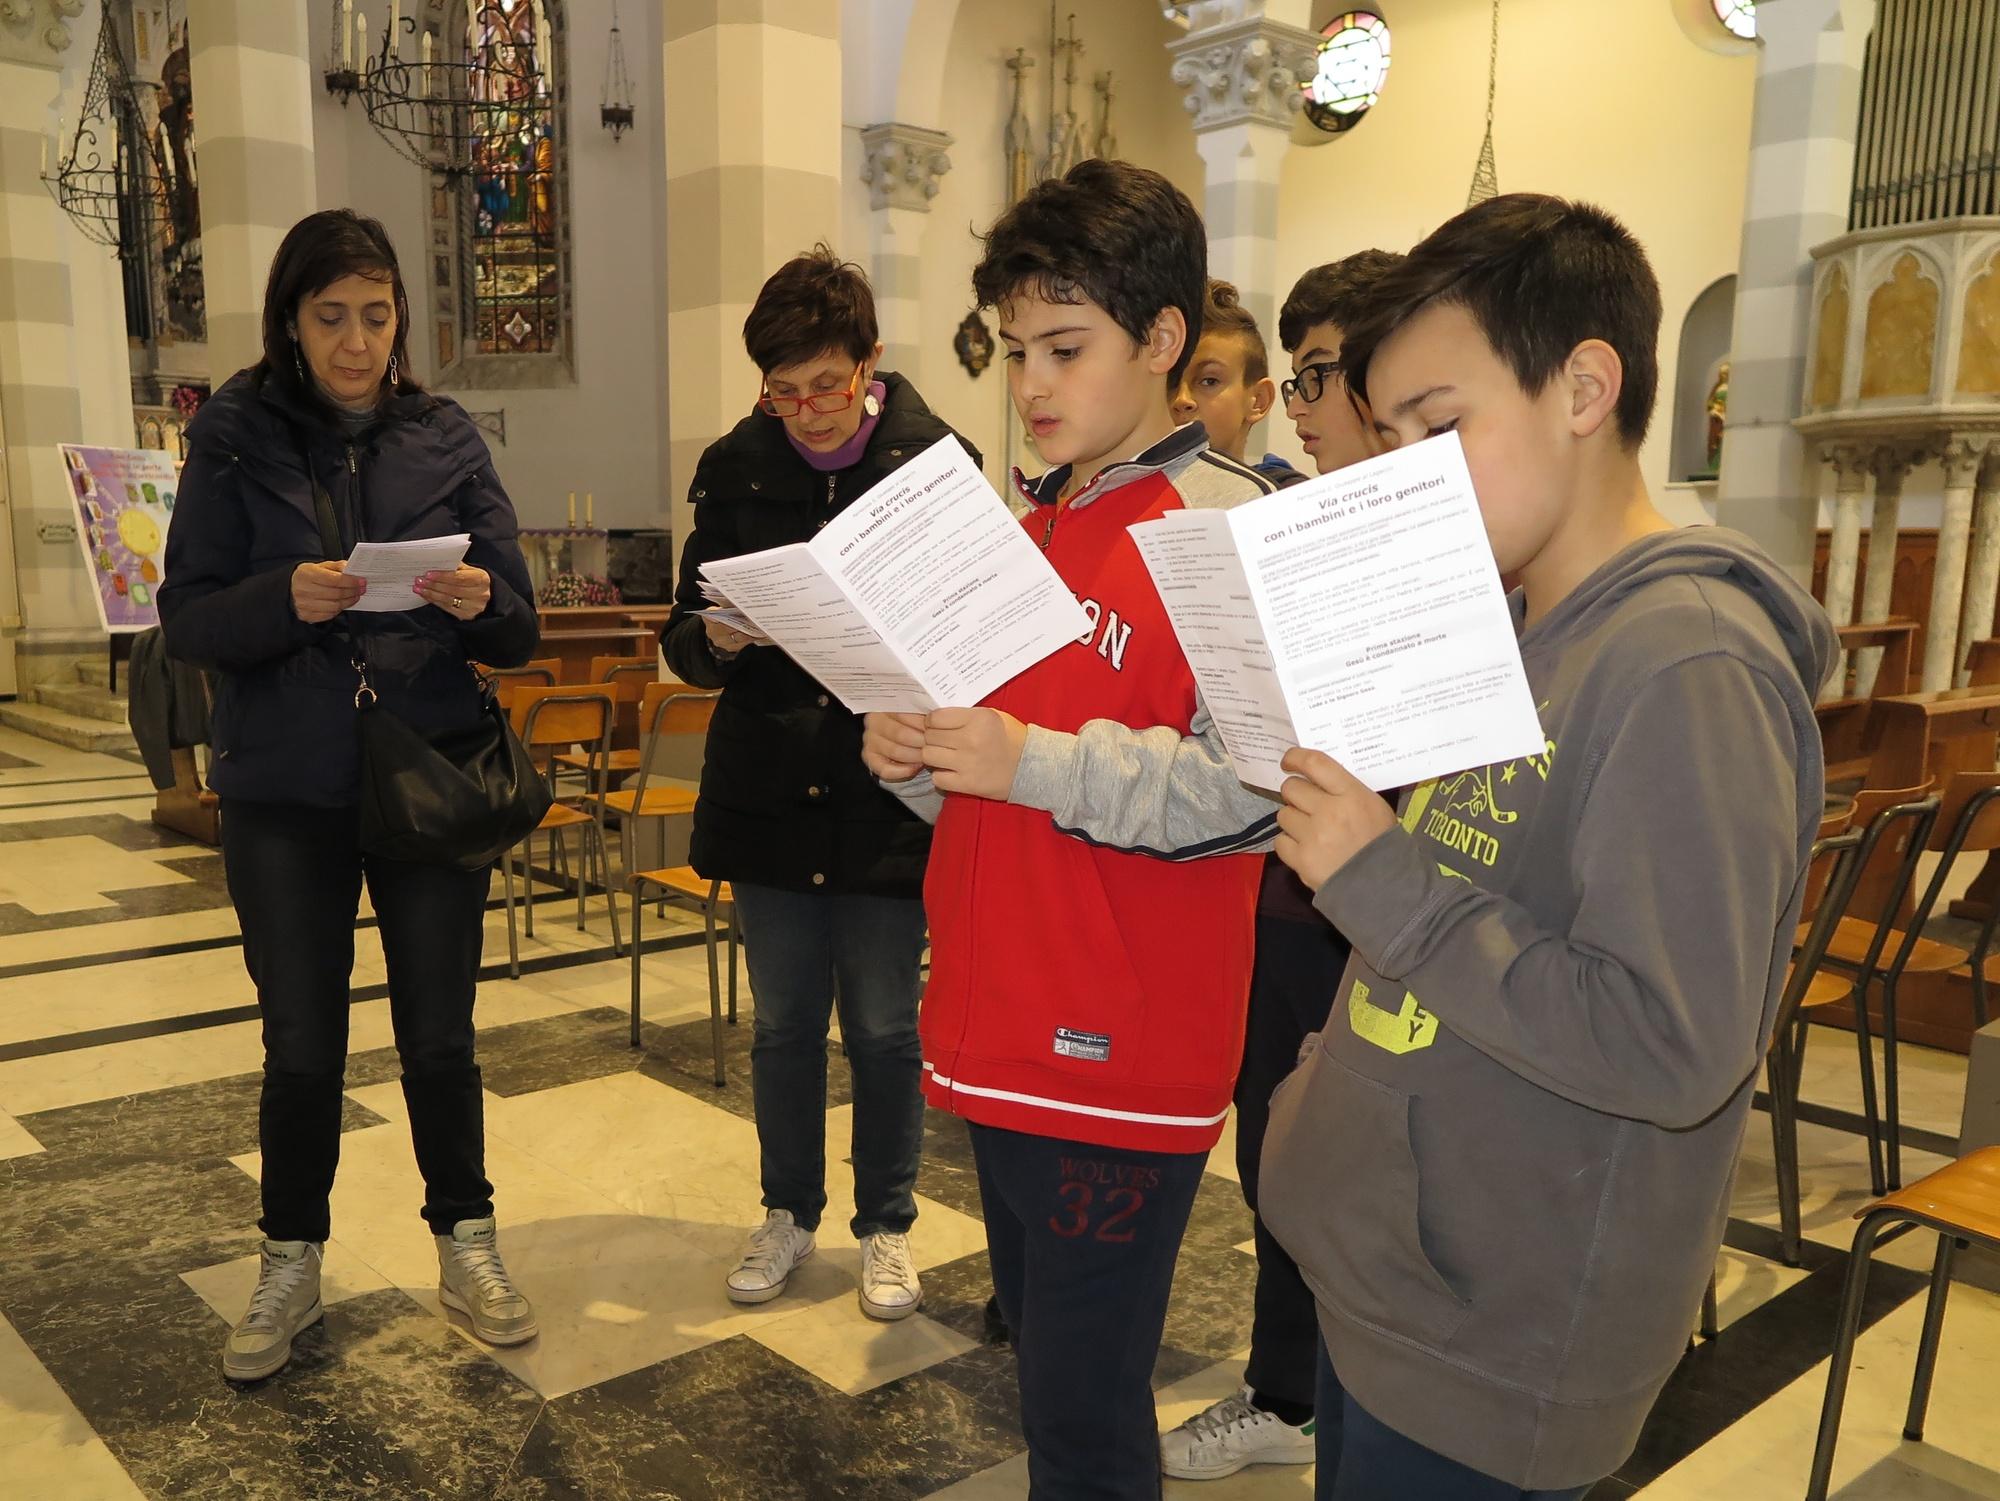 via-crucis-catechismo-2016-03-18-15-20-39